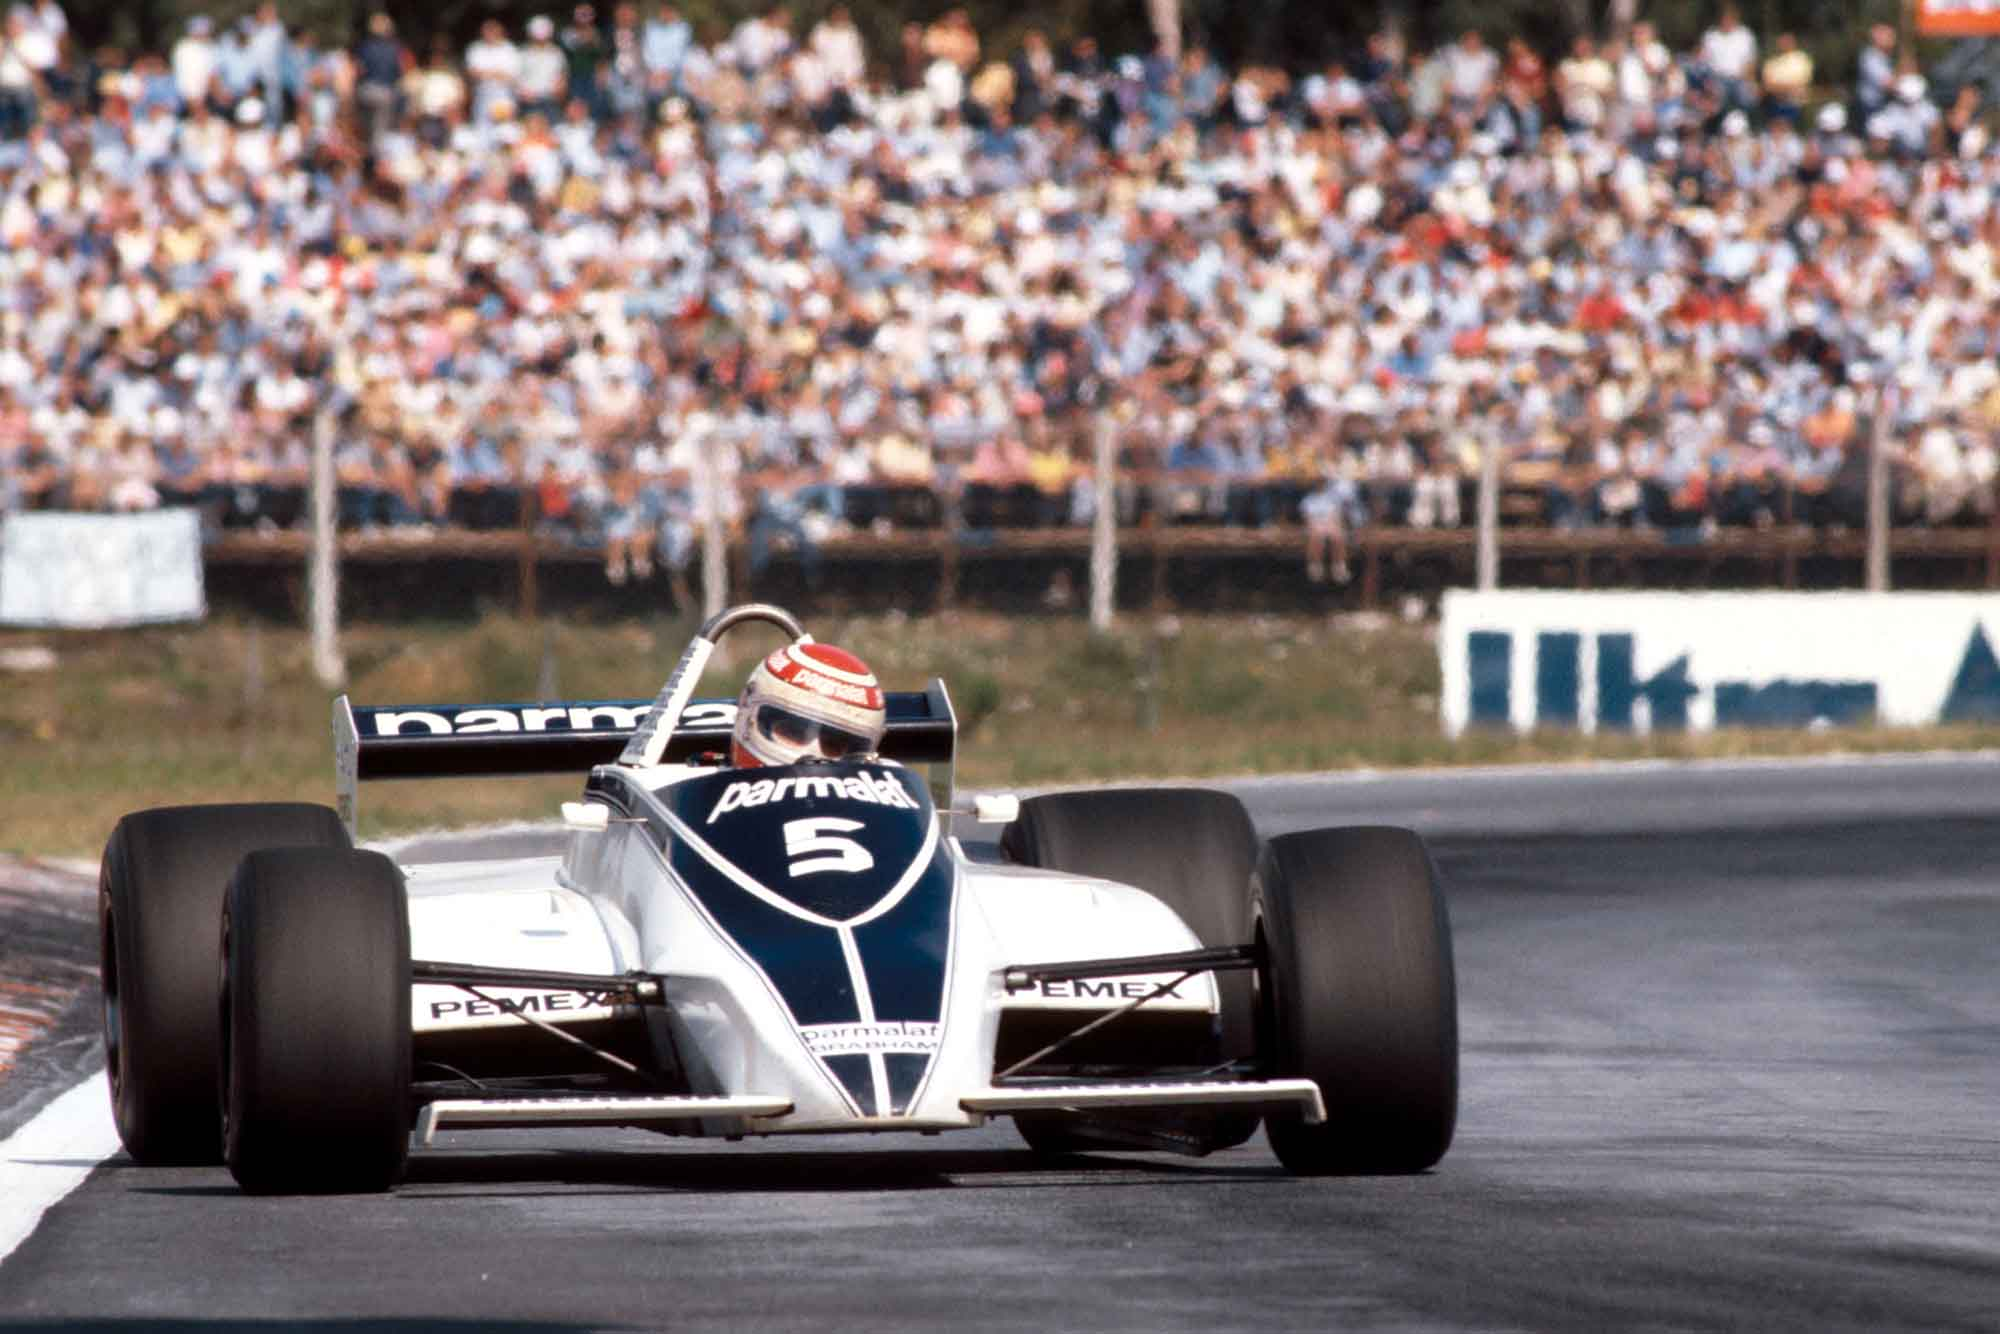 Nelson Piquet in his Brabham 1981 Argentina Grand Prix